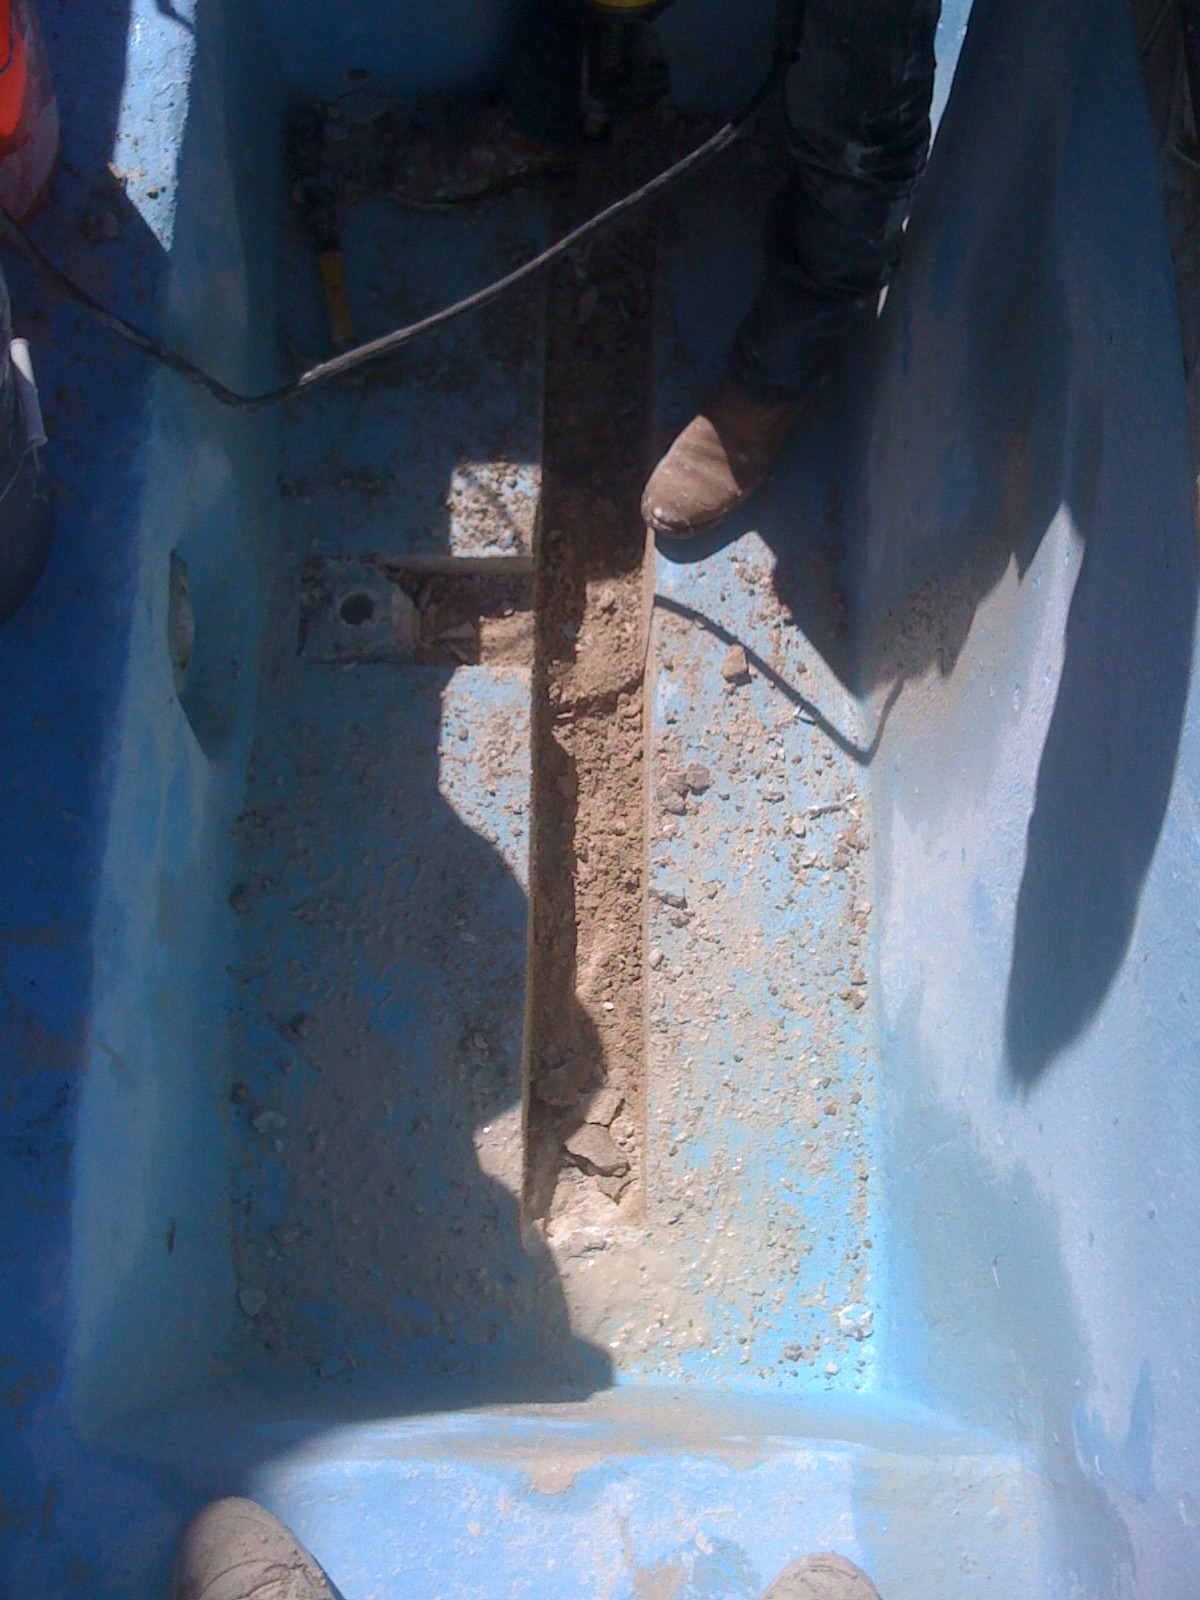 Jobs done photo gallery Swimming pool leak detection brisbane